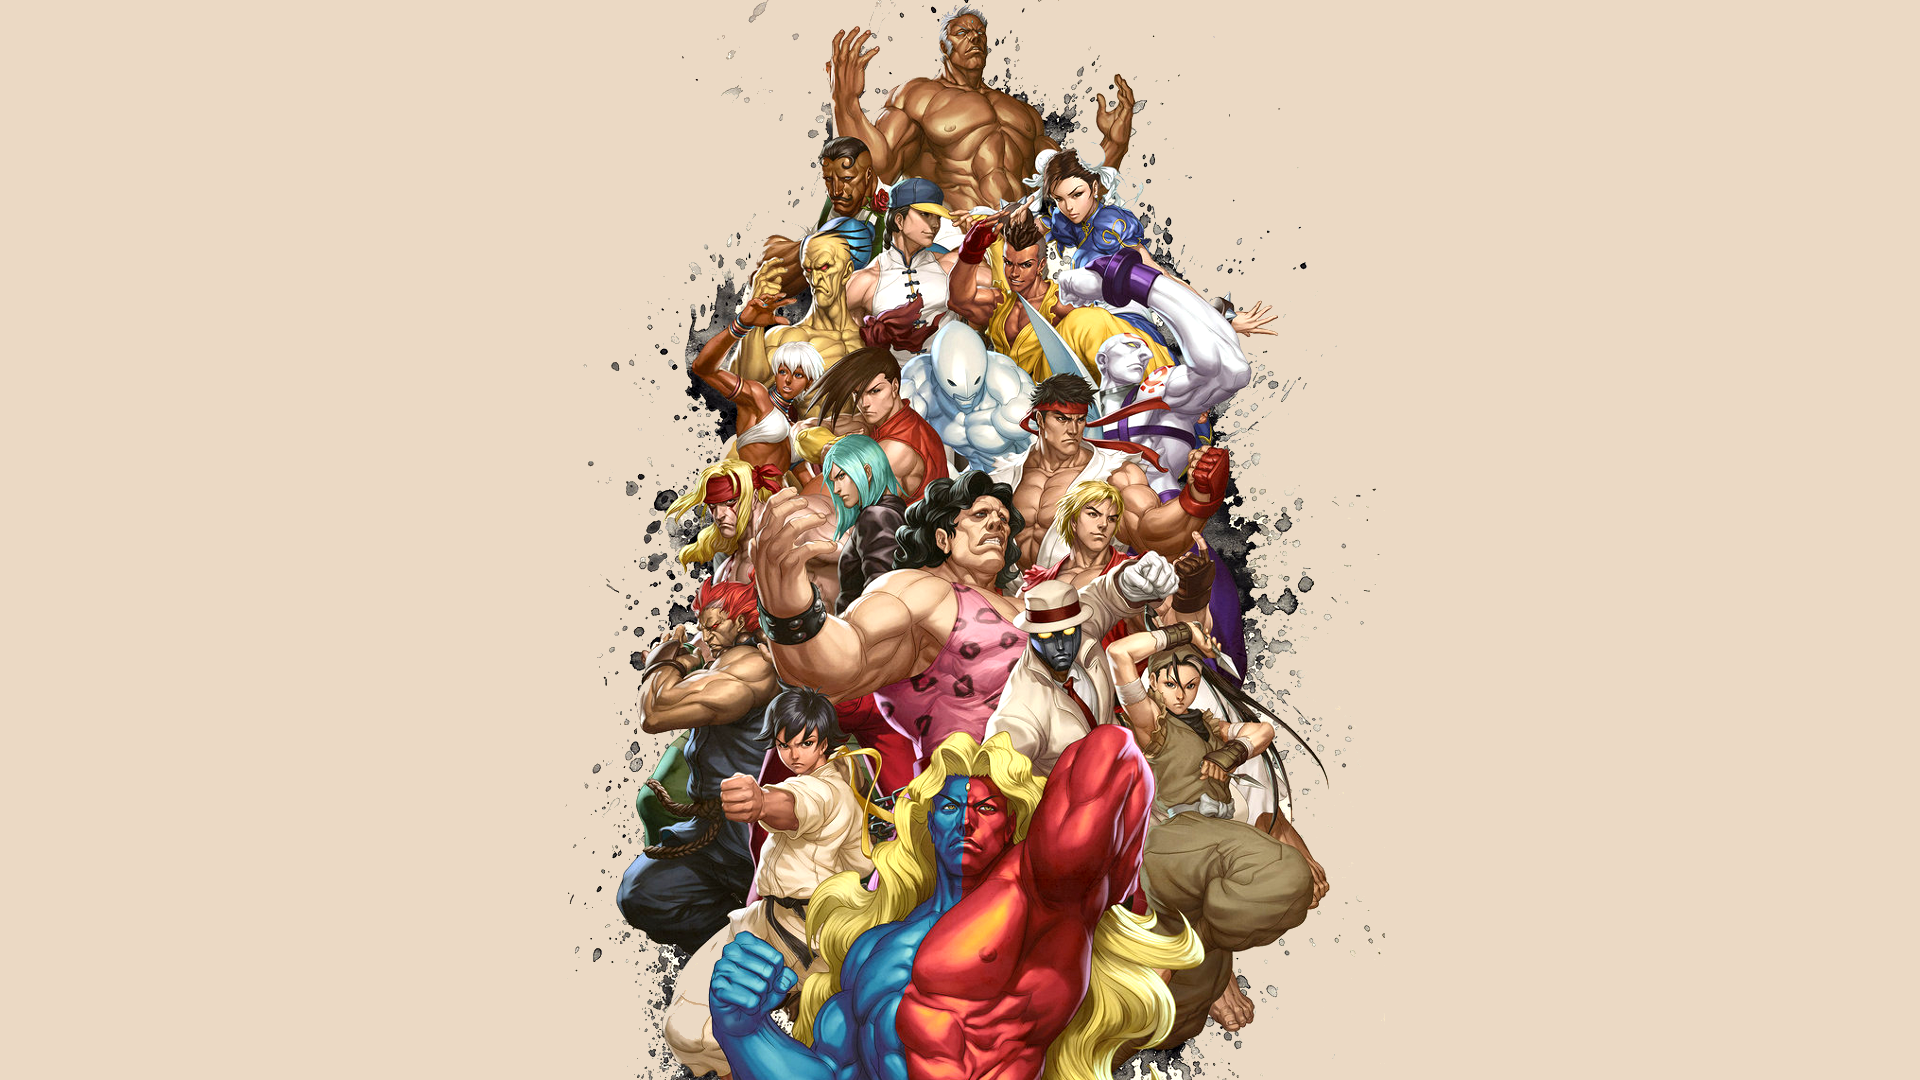 Street Fighter Iii 3rd Strike Details Launchbox Games Database